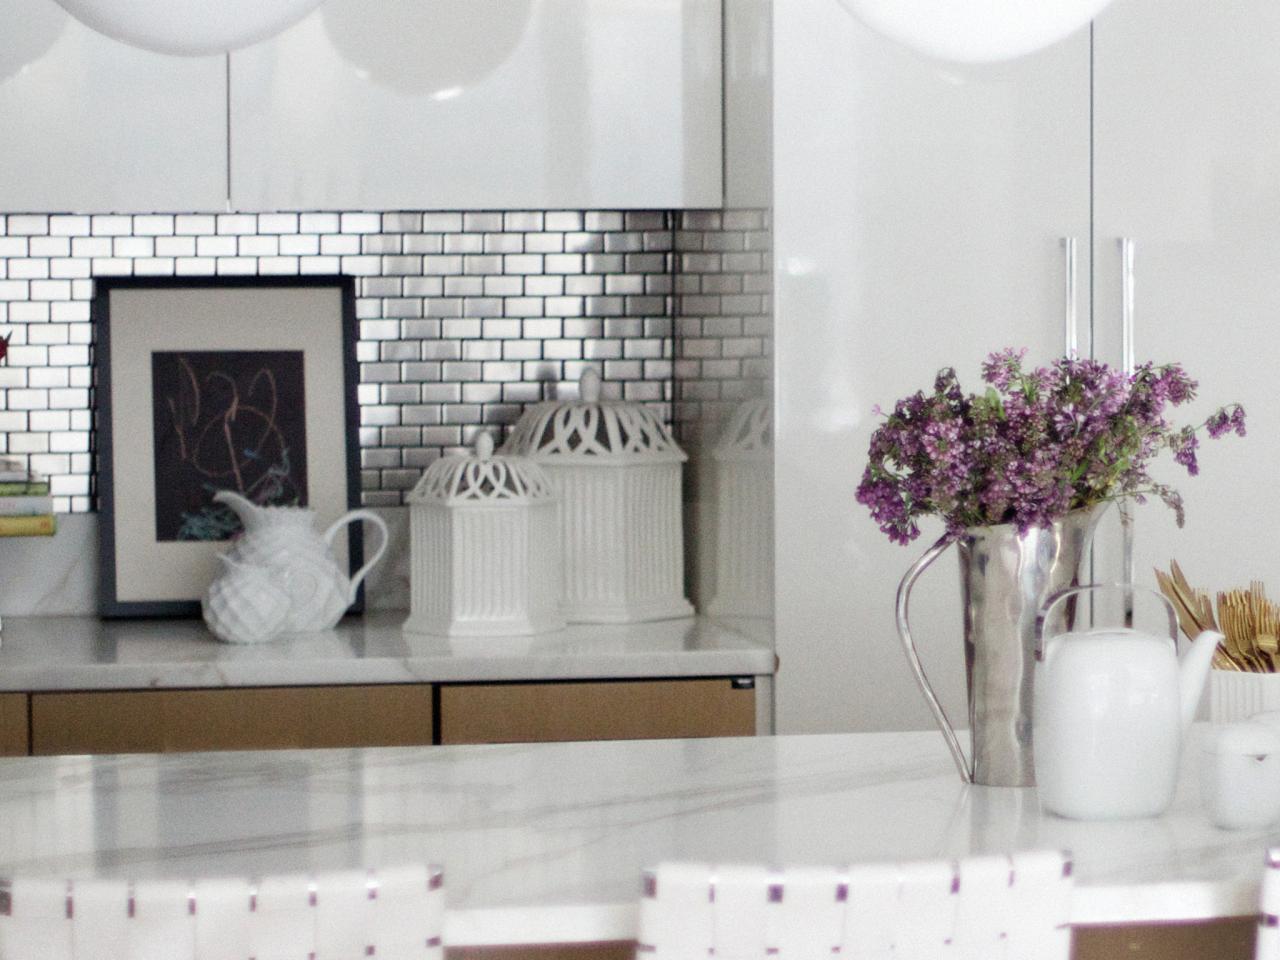 Uncategorized Tile Sheets For Kitchen Backsplash tiling a backsplash with tile sheets stainless steel tiles pictures ideas from hgtv hgtv